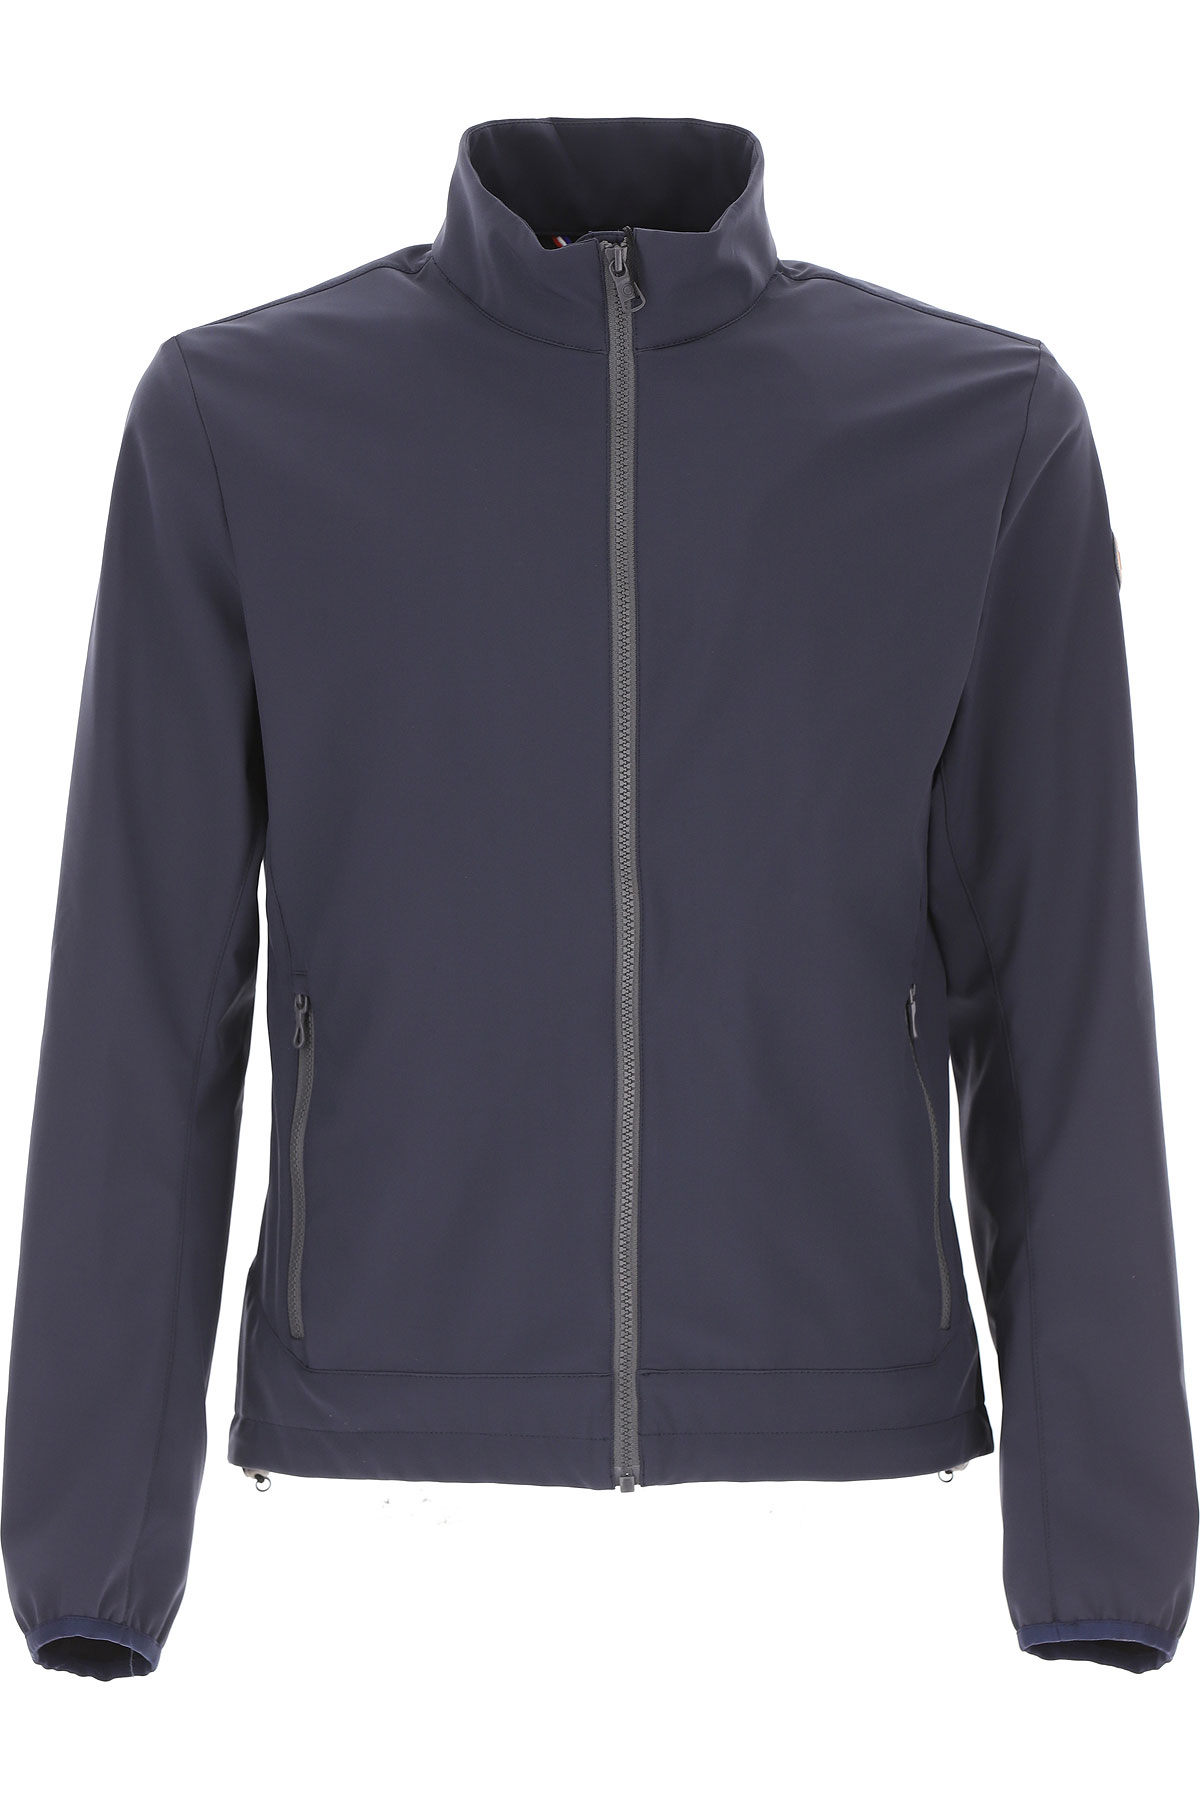 Colmar Jacket for Men On Sale, Navy Blue, polyester, 2019, L M XL XXL